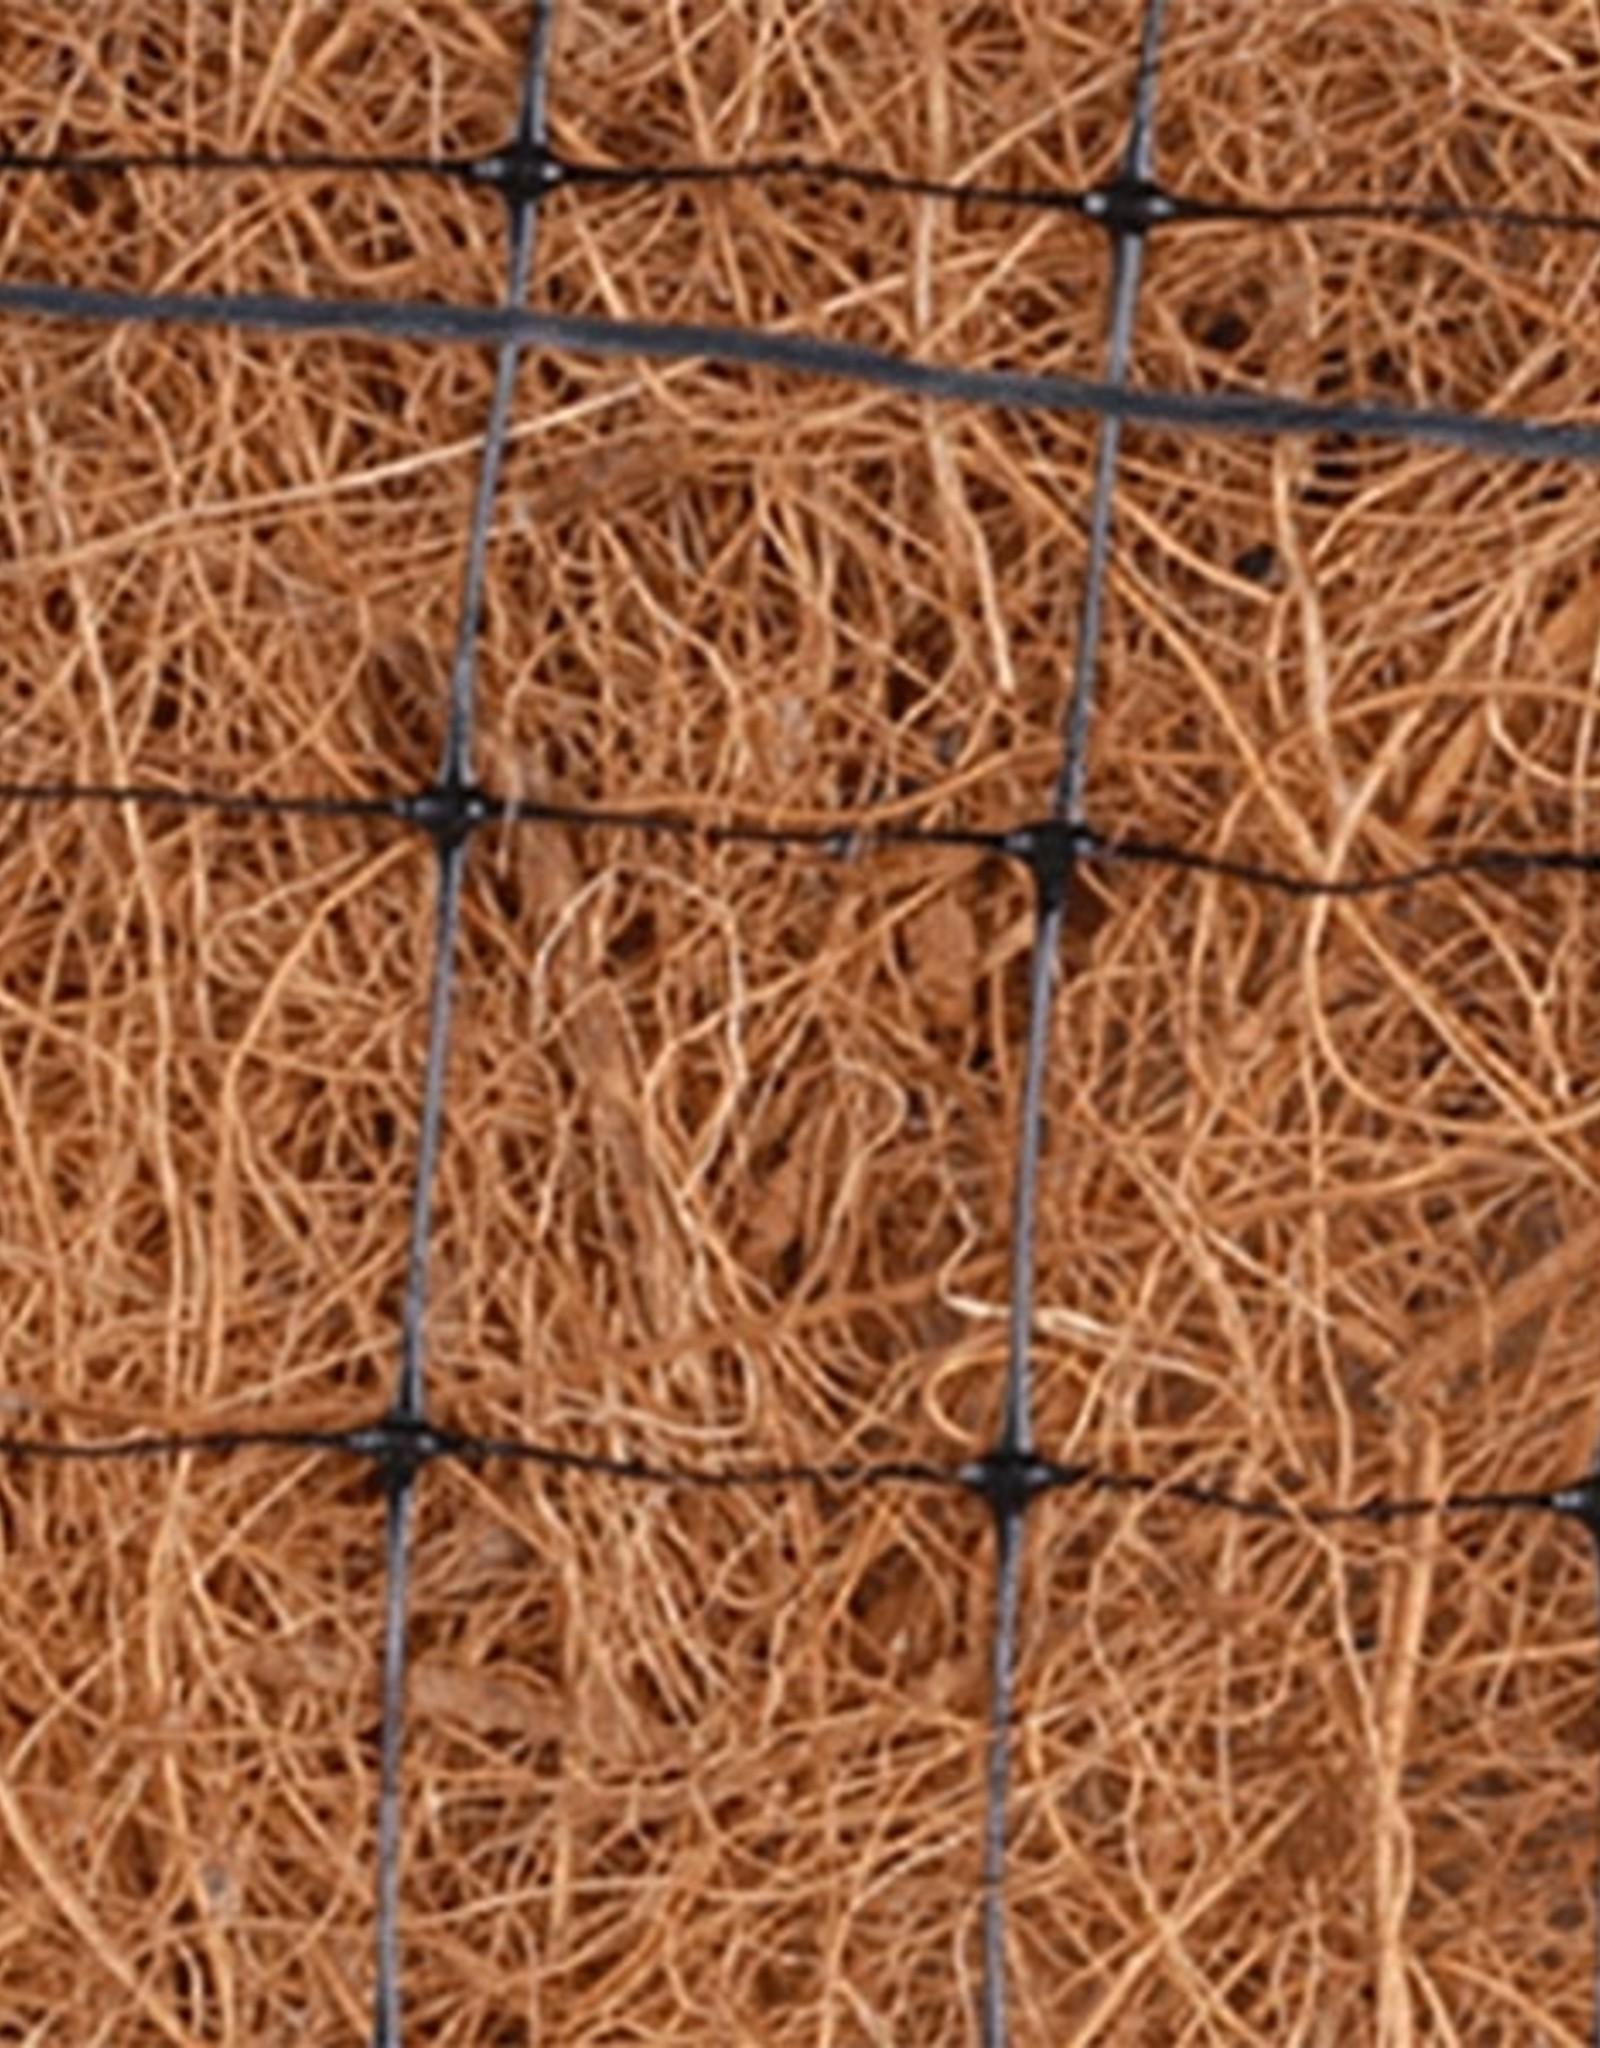 Double Net 100% Coconut Erosion Control Blanket-US-2C, SZ. 8' x 112.5'